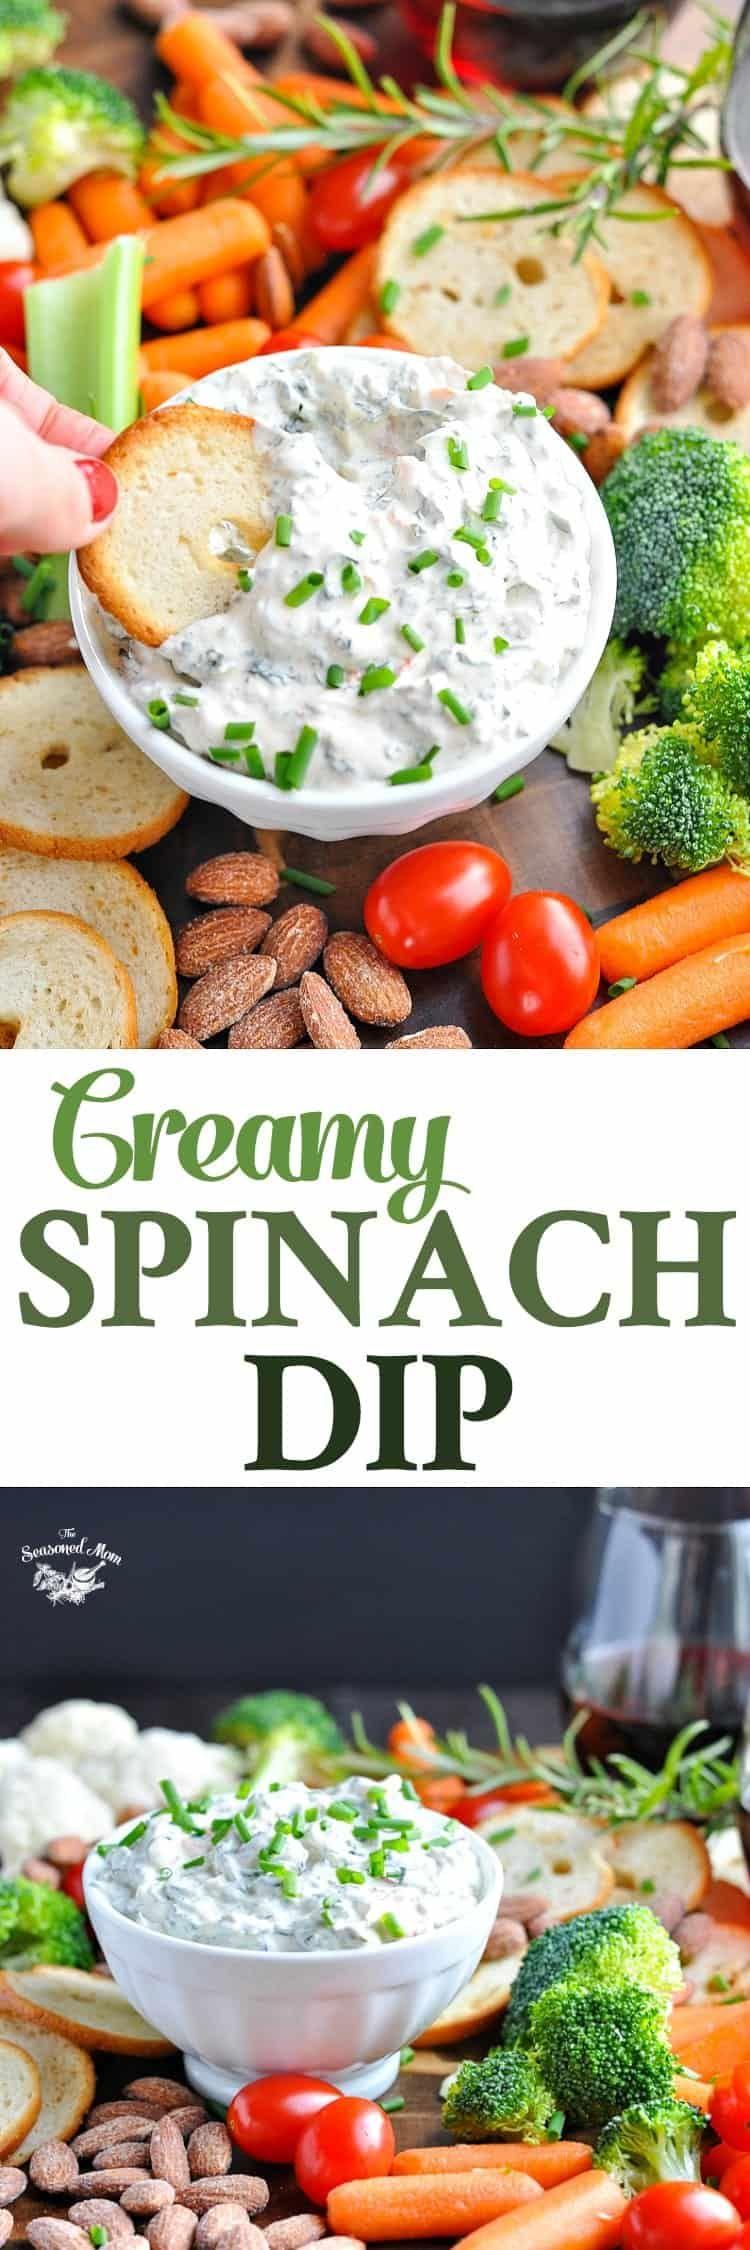 5ingredient spinach dip recipe diy food recipes diy